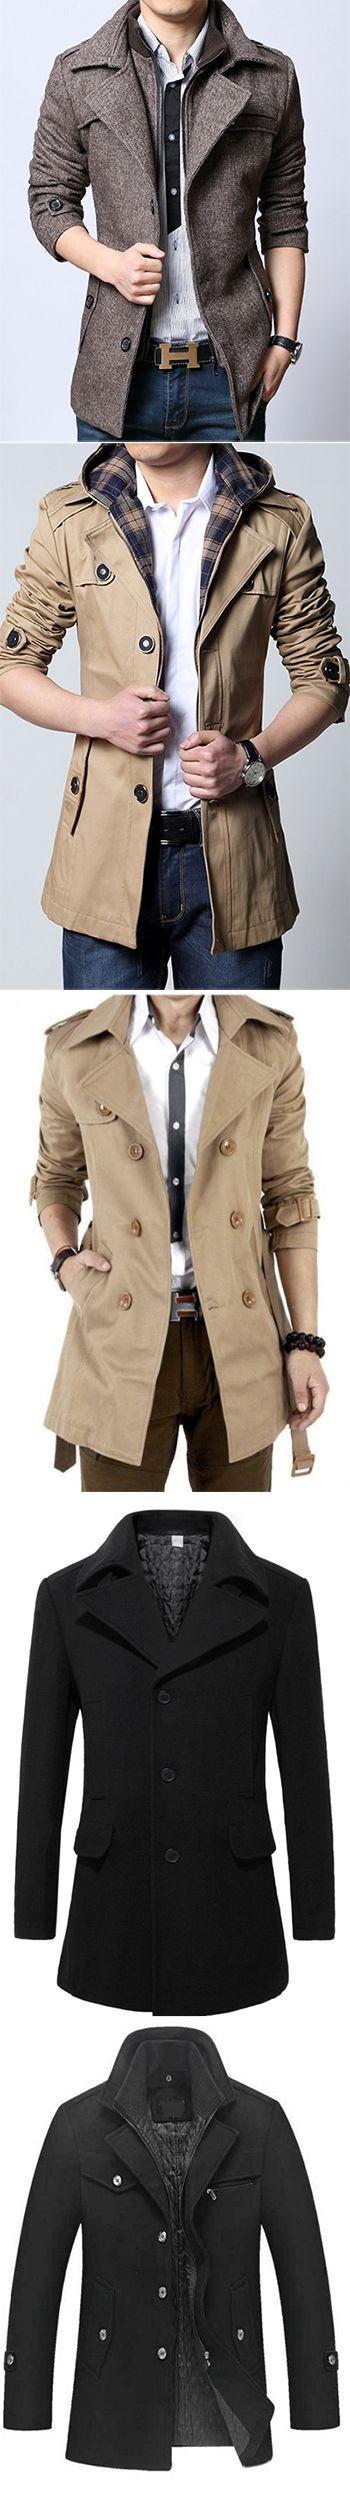 70 best men u0027s fashion images on pinterest menswear fashion